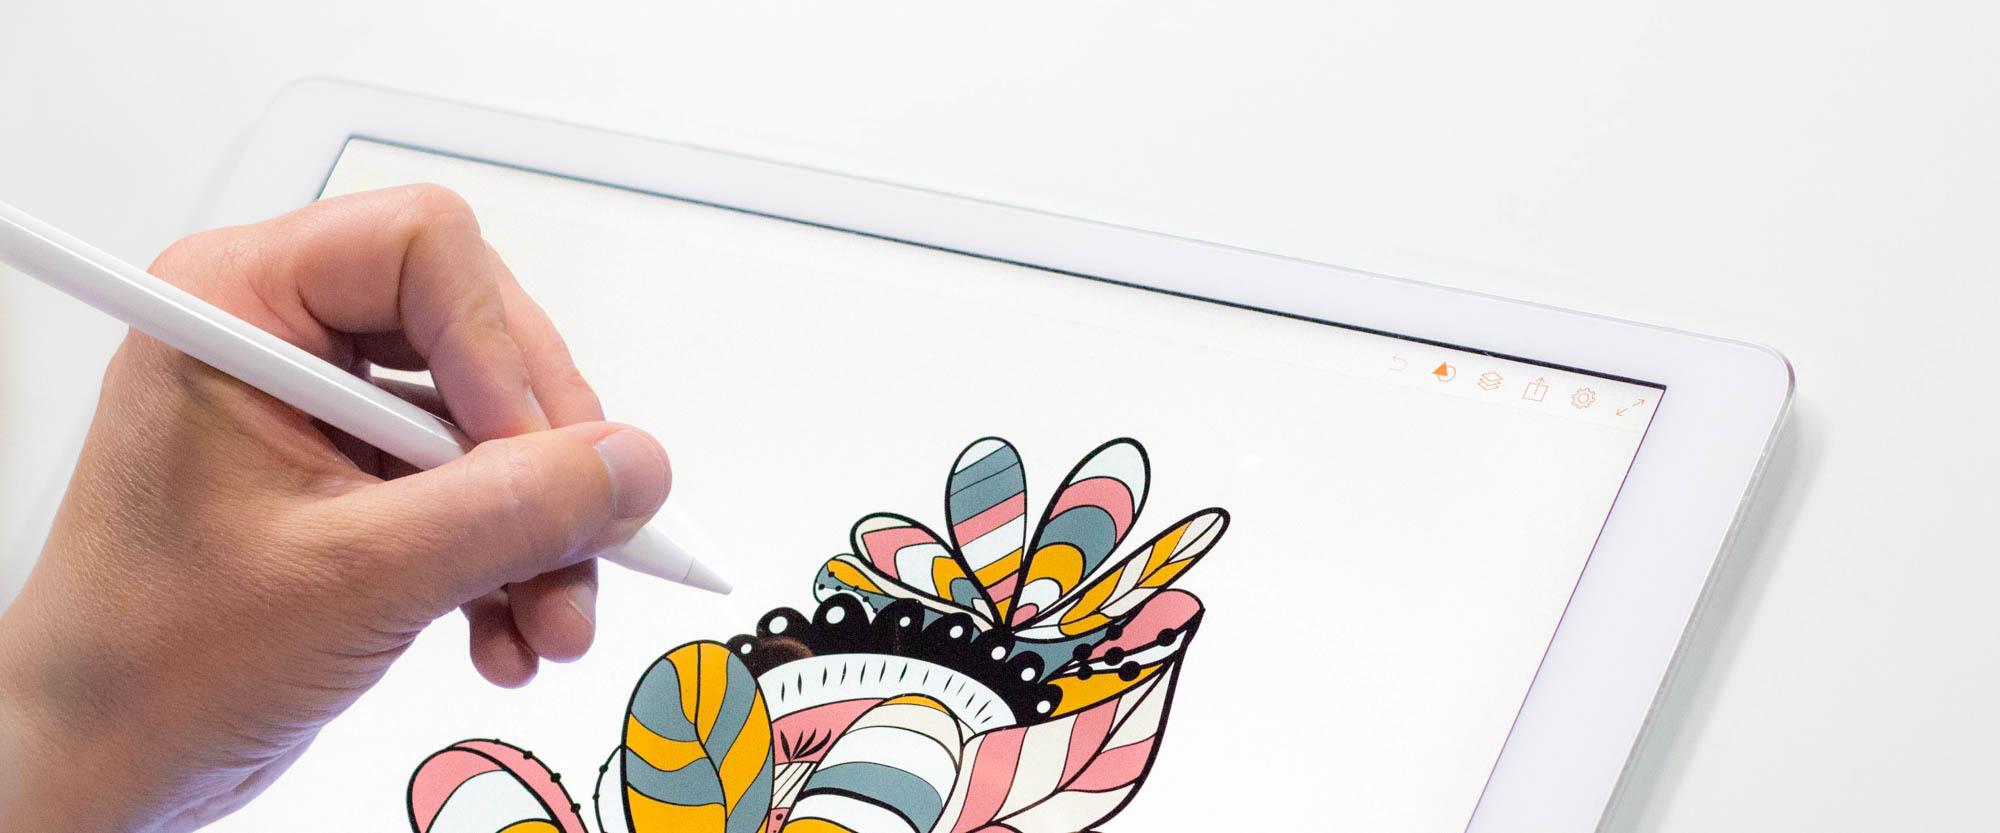 Rita i appen Adobe Draw  629e6b6d8058c